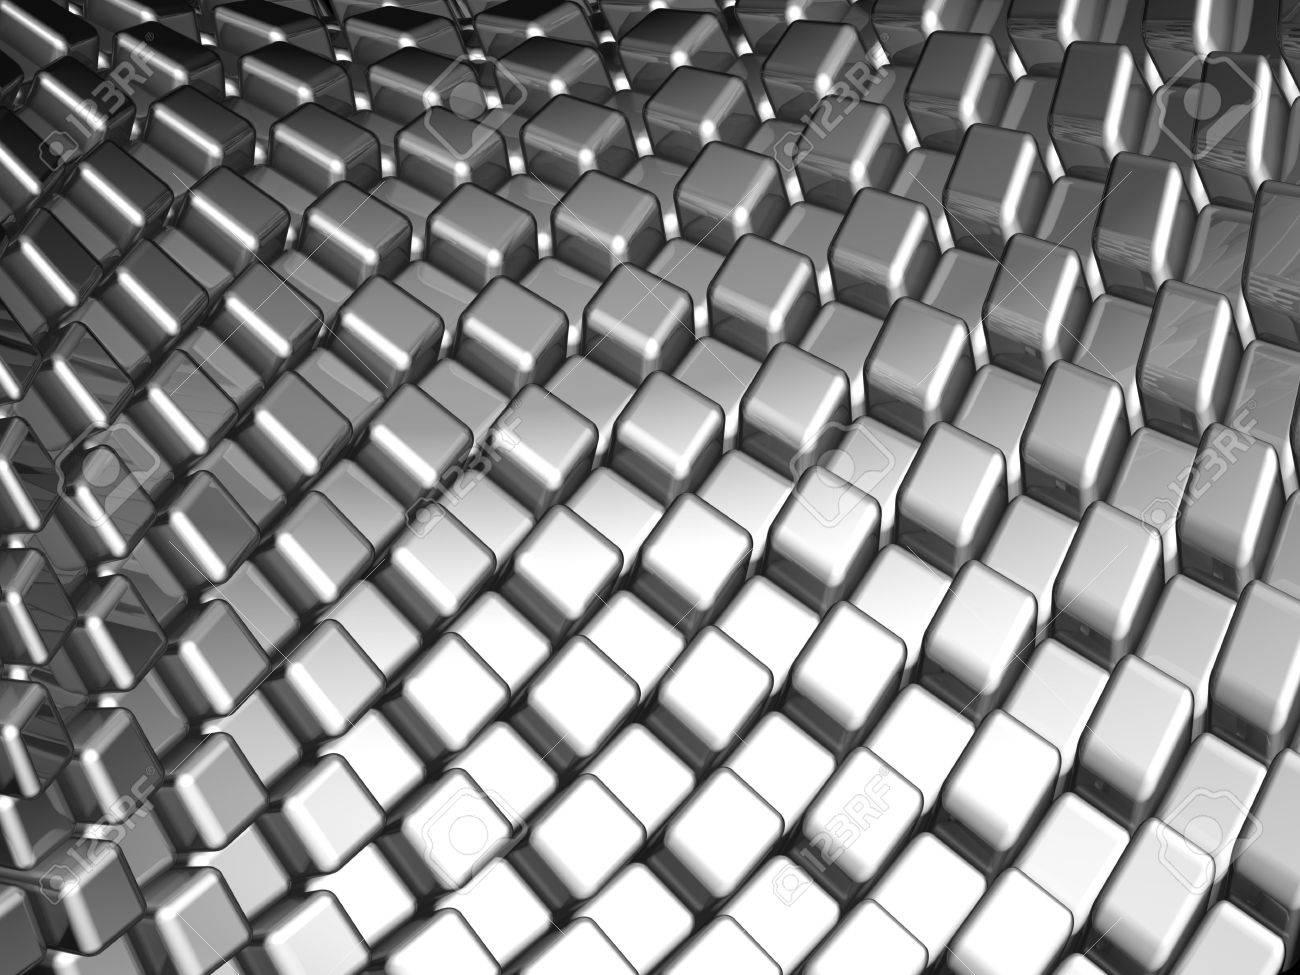 Abstract aluminum dynamic cube background pattern 3d illustration Stock Illustration - 7229872